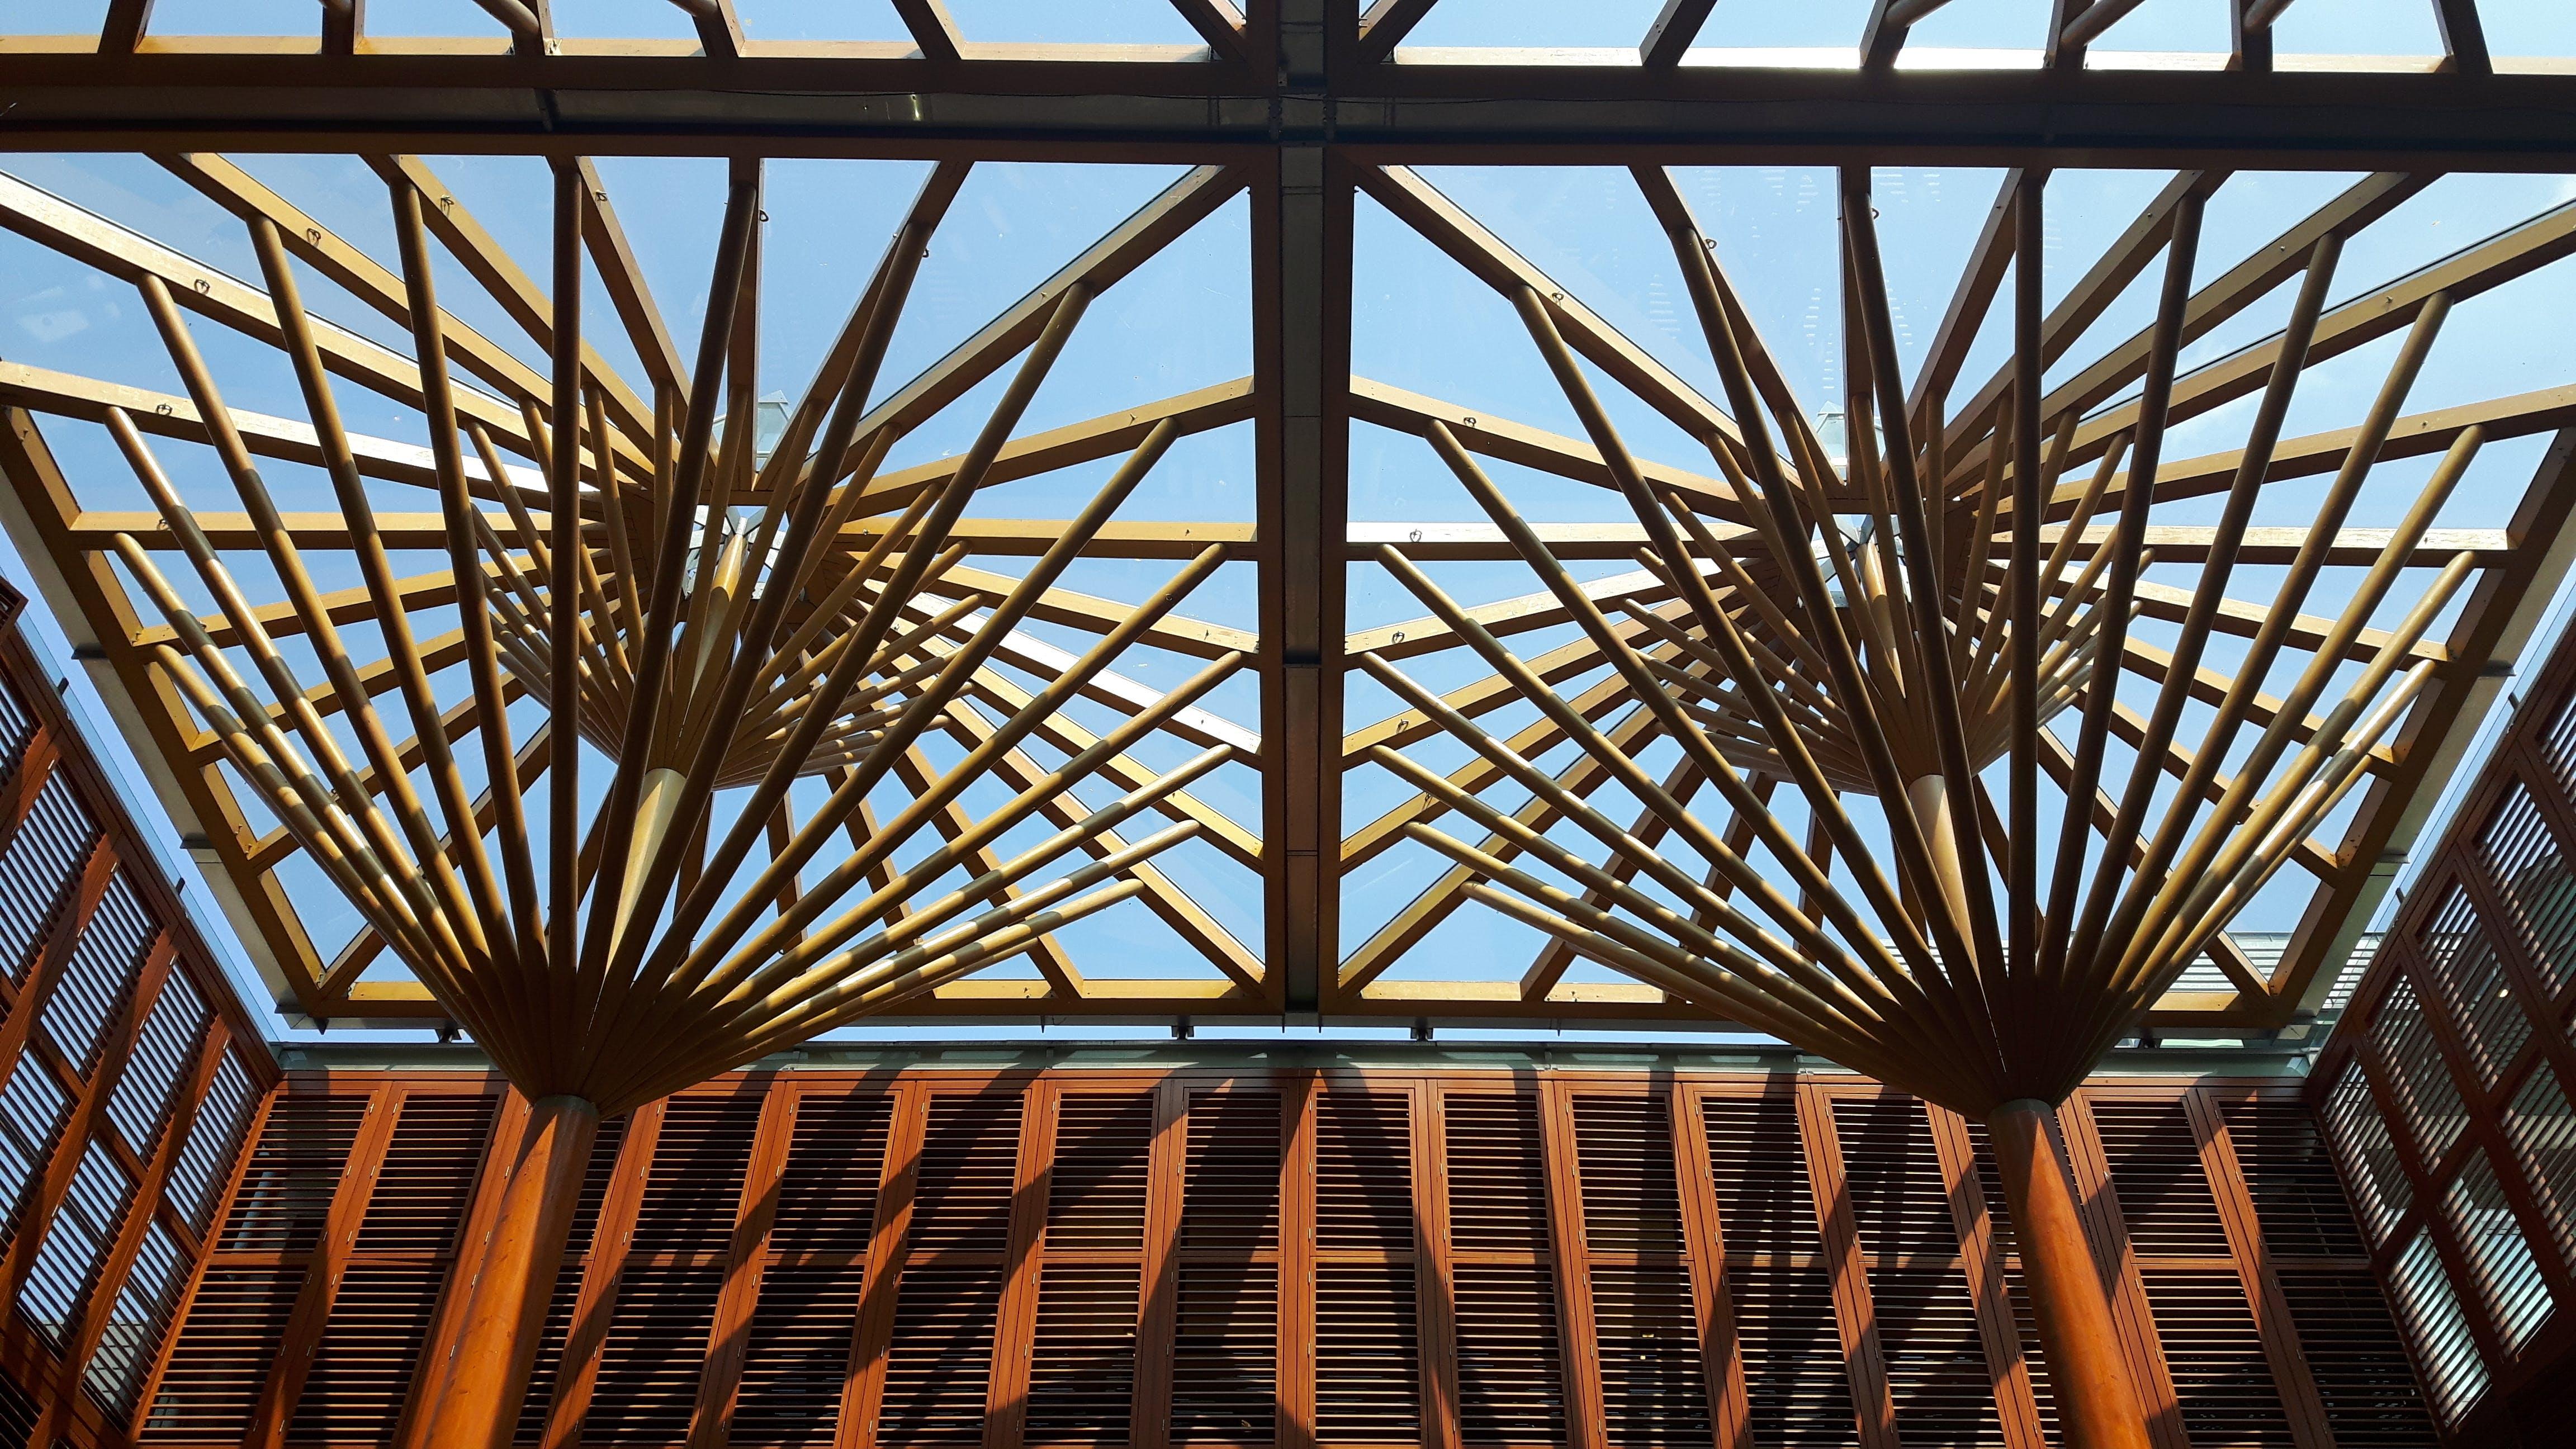 Free stock photo of #maastricht, #mosae forum, #shopping mall, #orange blue